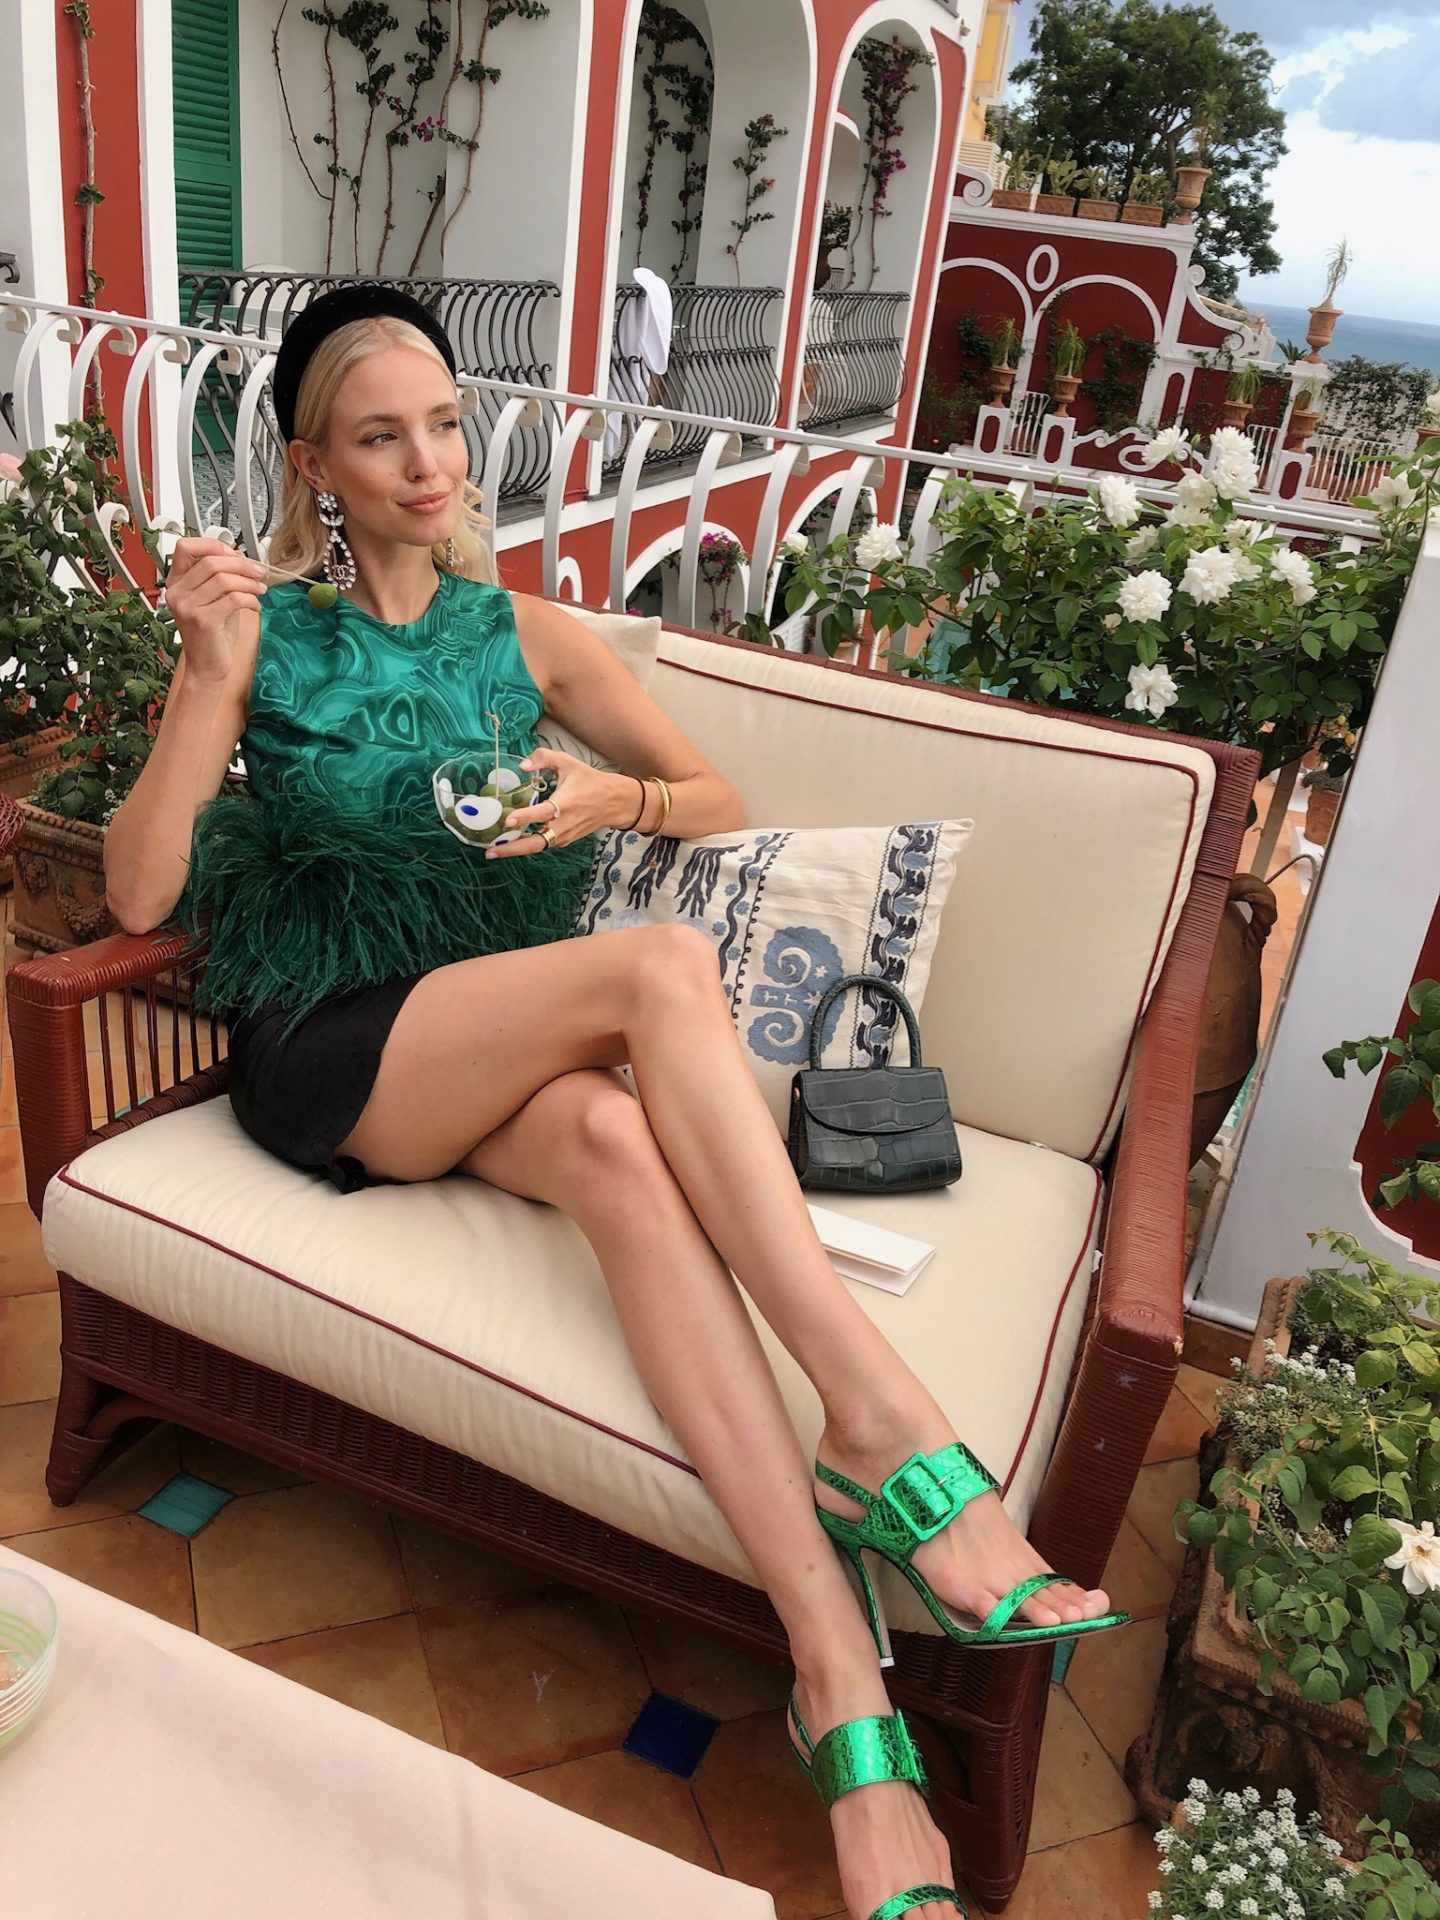 Champagne & Oyster Bar Leonie Hanne